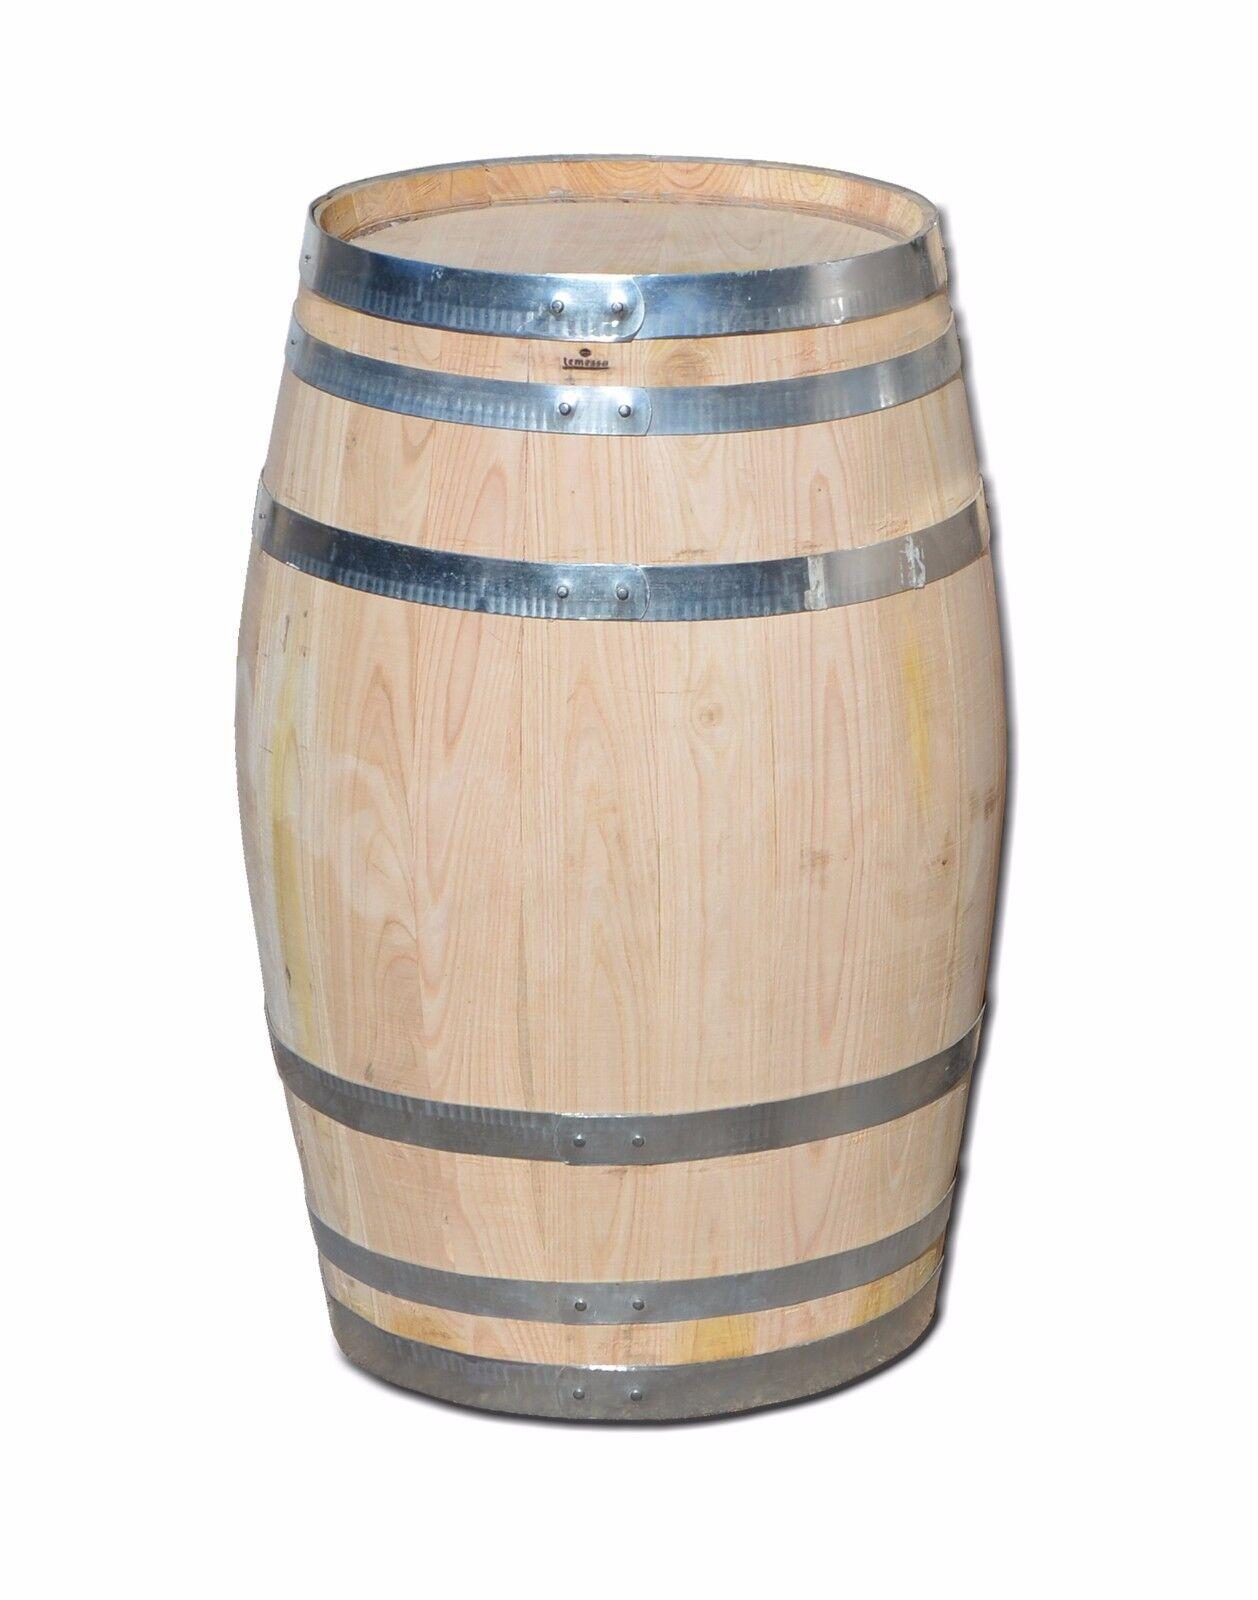 Kastanienfaß, Holzfaß, Faß, Regentonne, Weinfaß, Regenfaß, Wasserfaß NEU 100 Lt